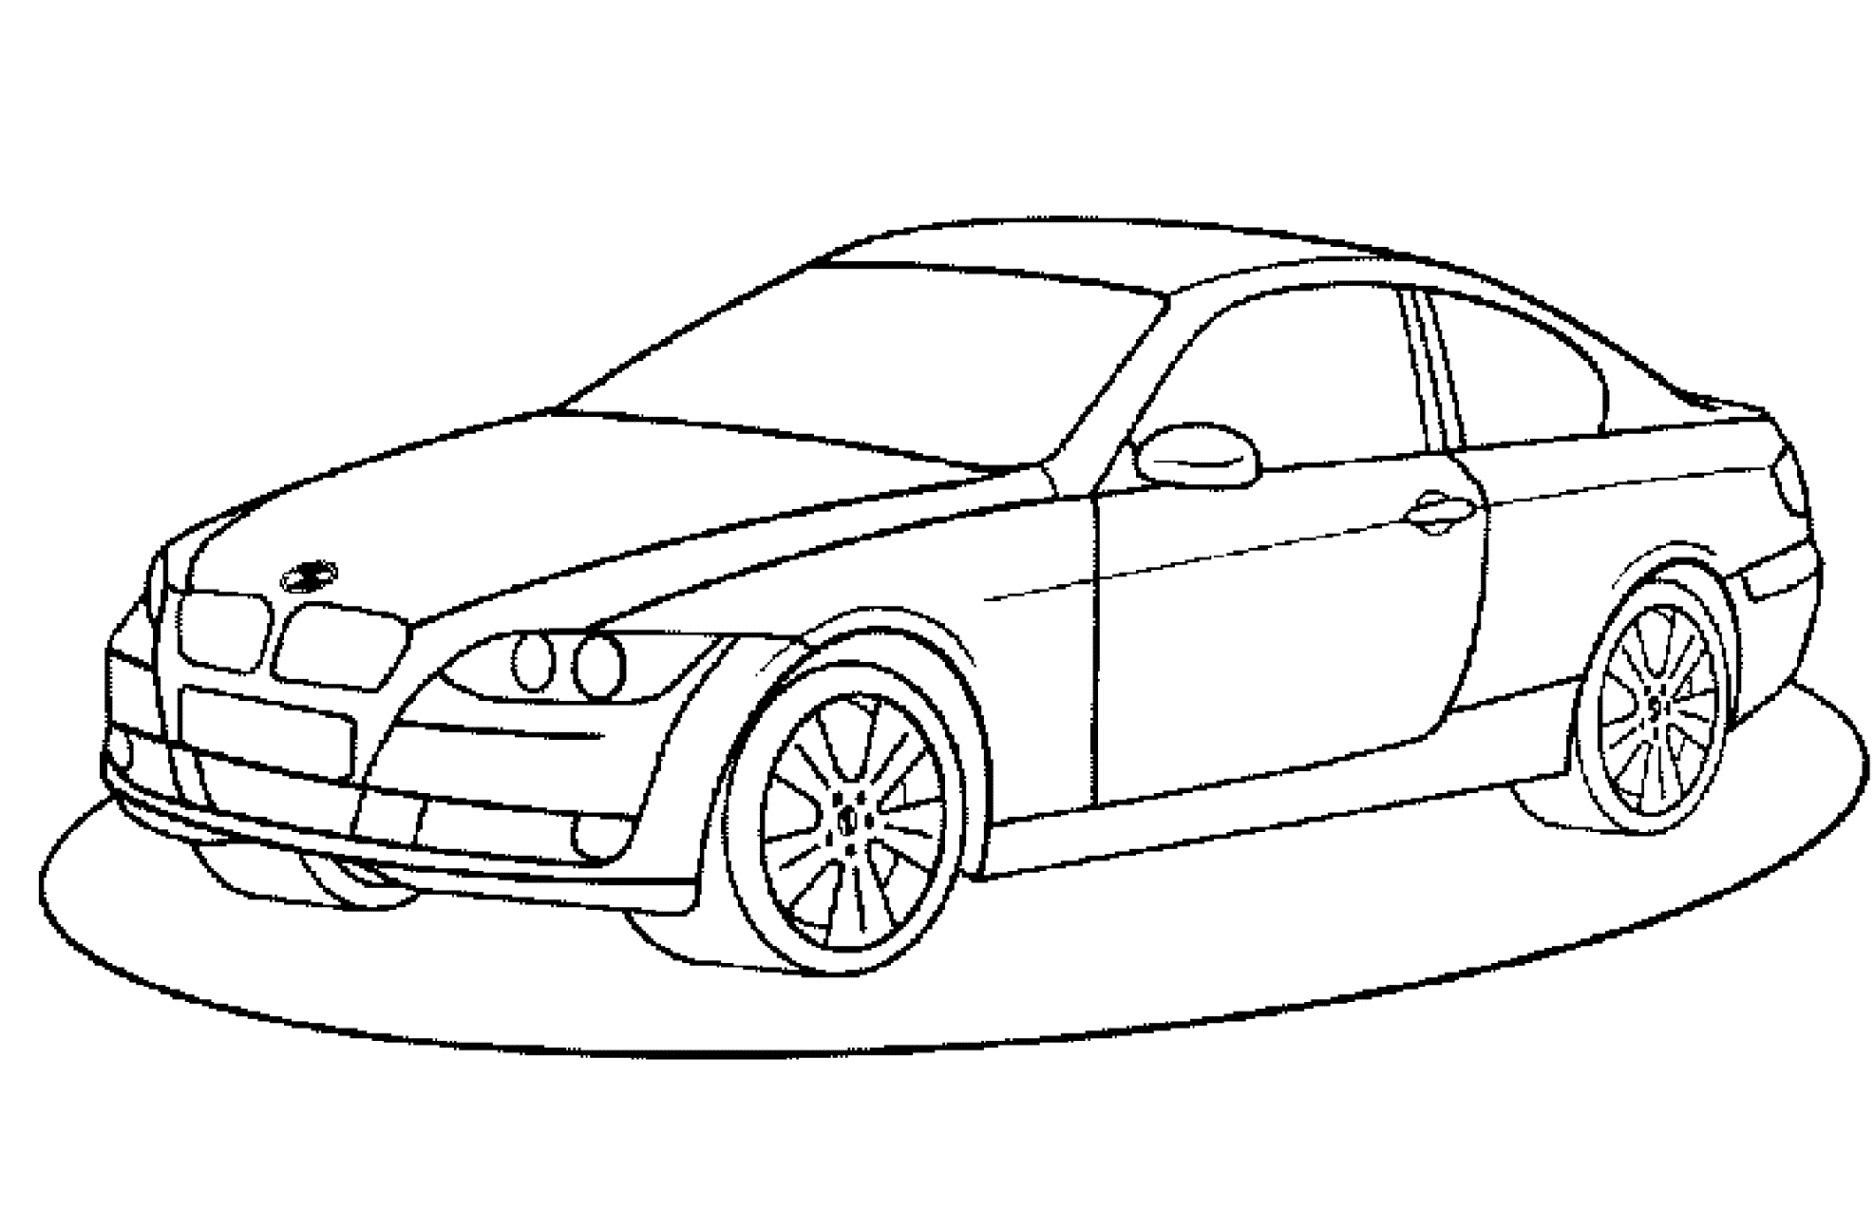 Ausmalbilder Audi R8 Neu 38 Audi Ausmalbilder